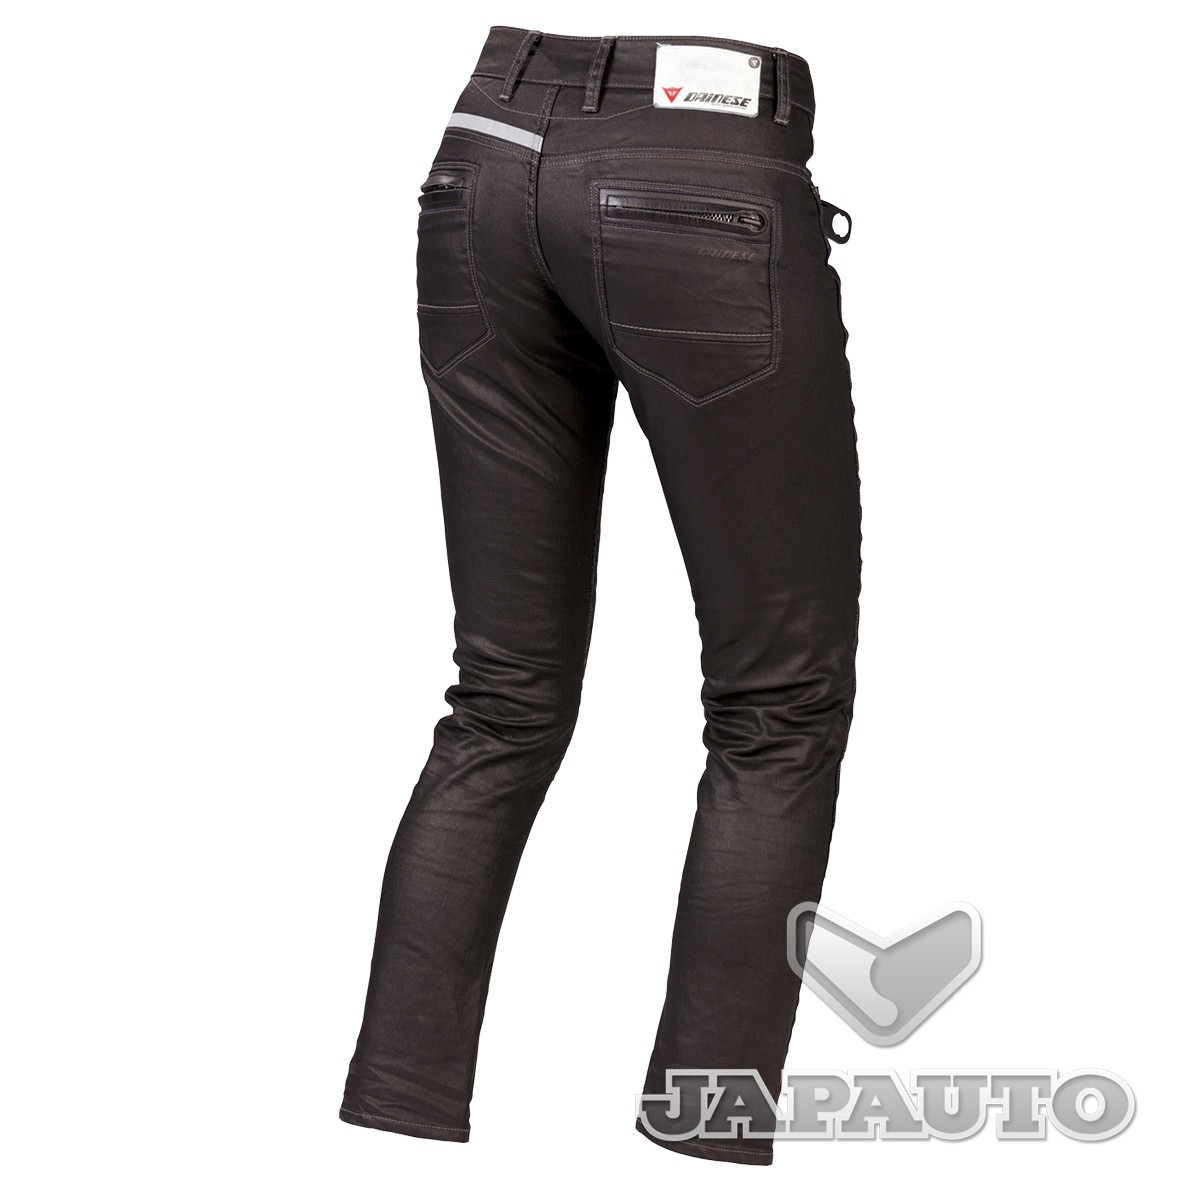 tout neuf 993ec 0da6e Pantalon Dainese D19 LADY 4K Femme